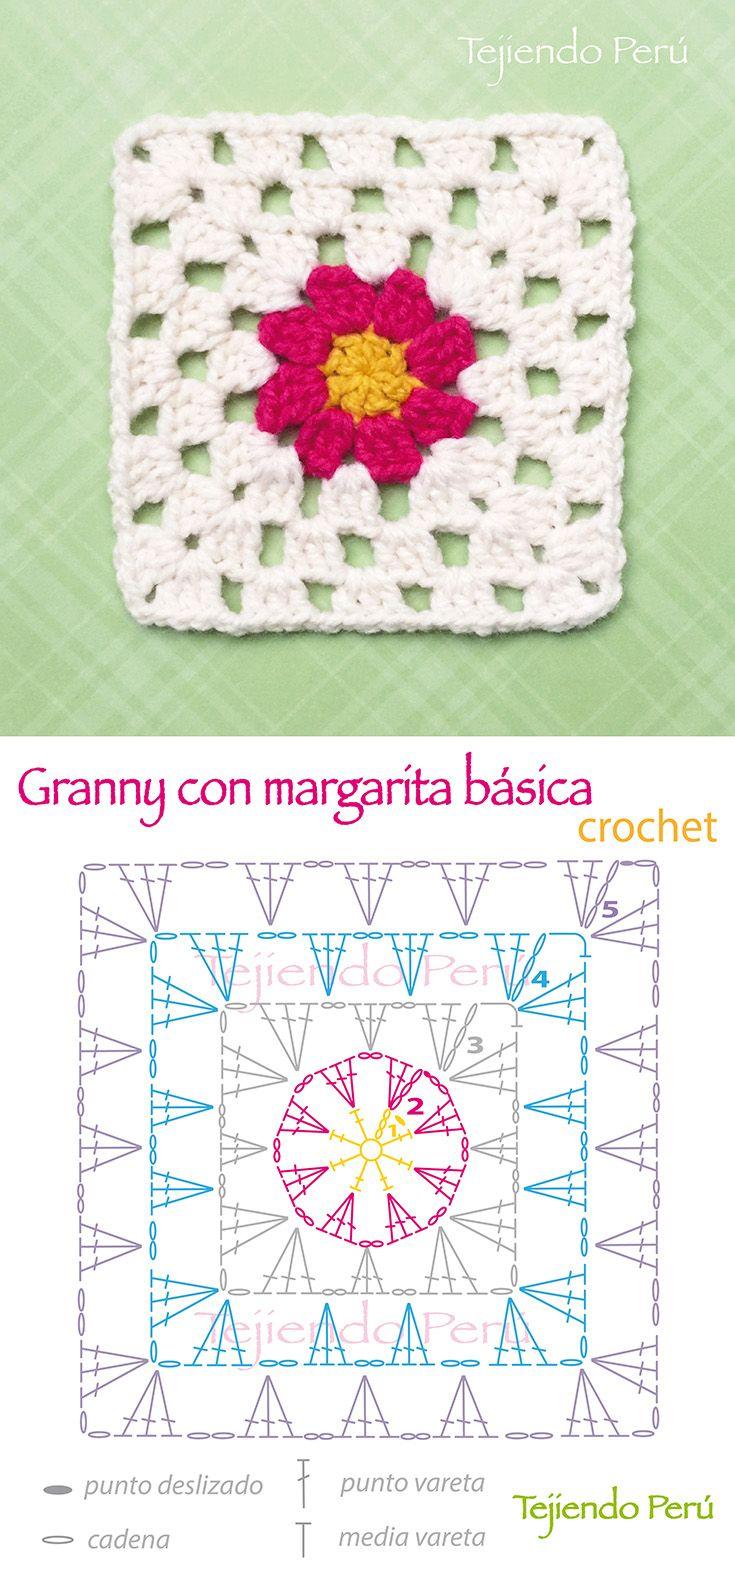 137 best 손뜨개 images on Pinterest | Crochet motif, Crochet granny ...